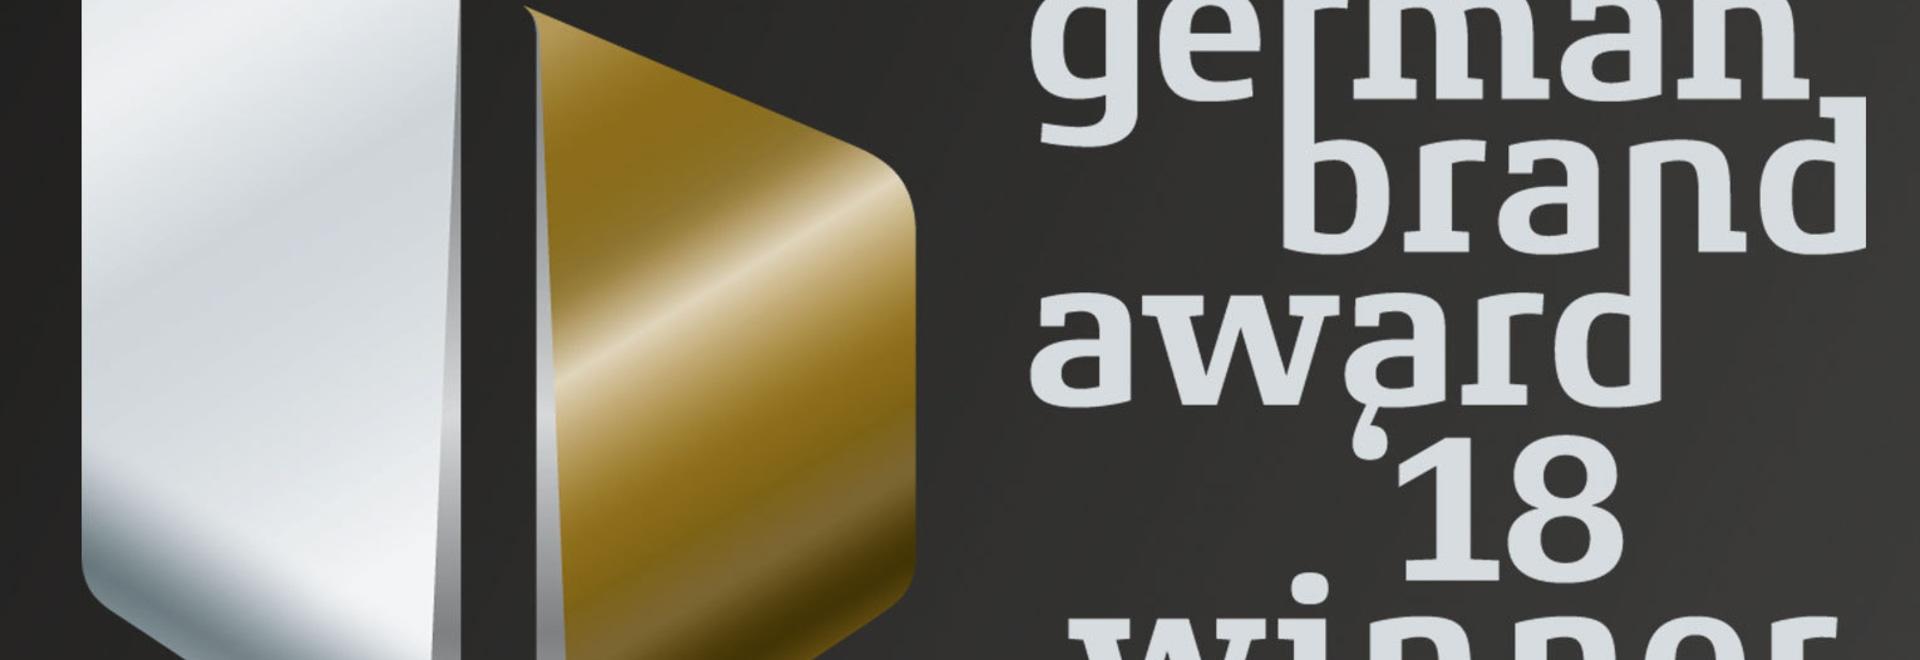 German Brand Award 18 Winner